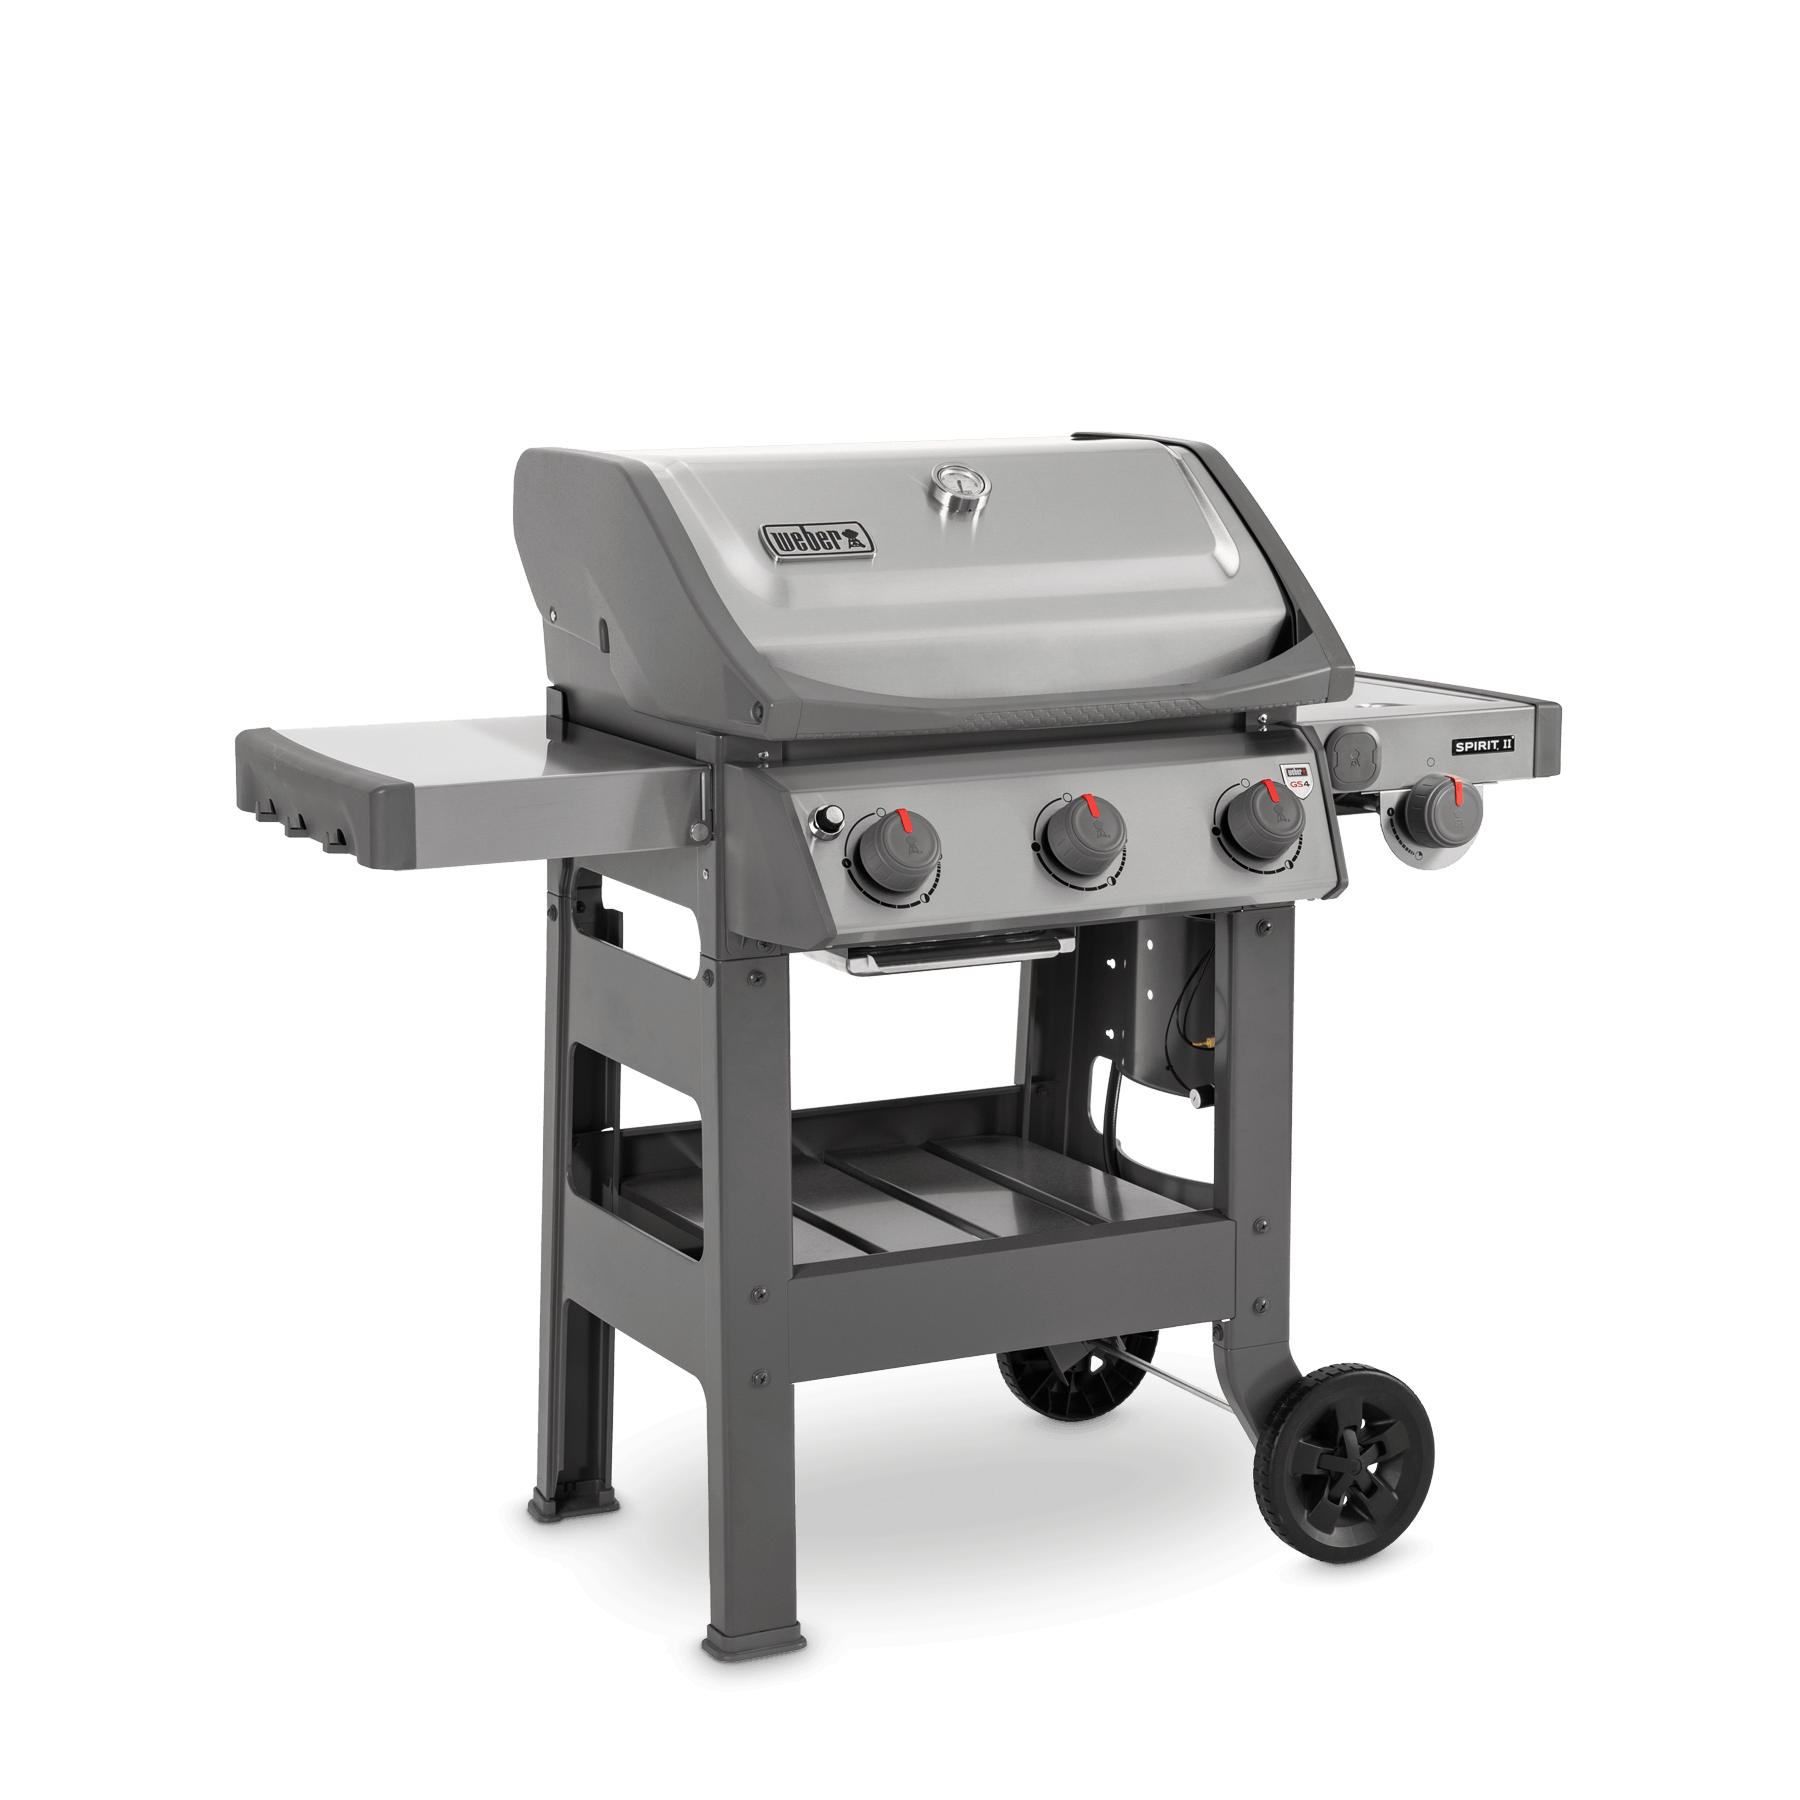 Spirit II S-320 GBS Gas Barbecue